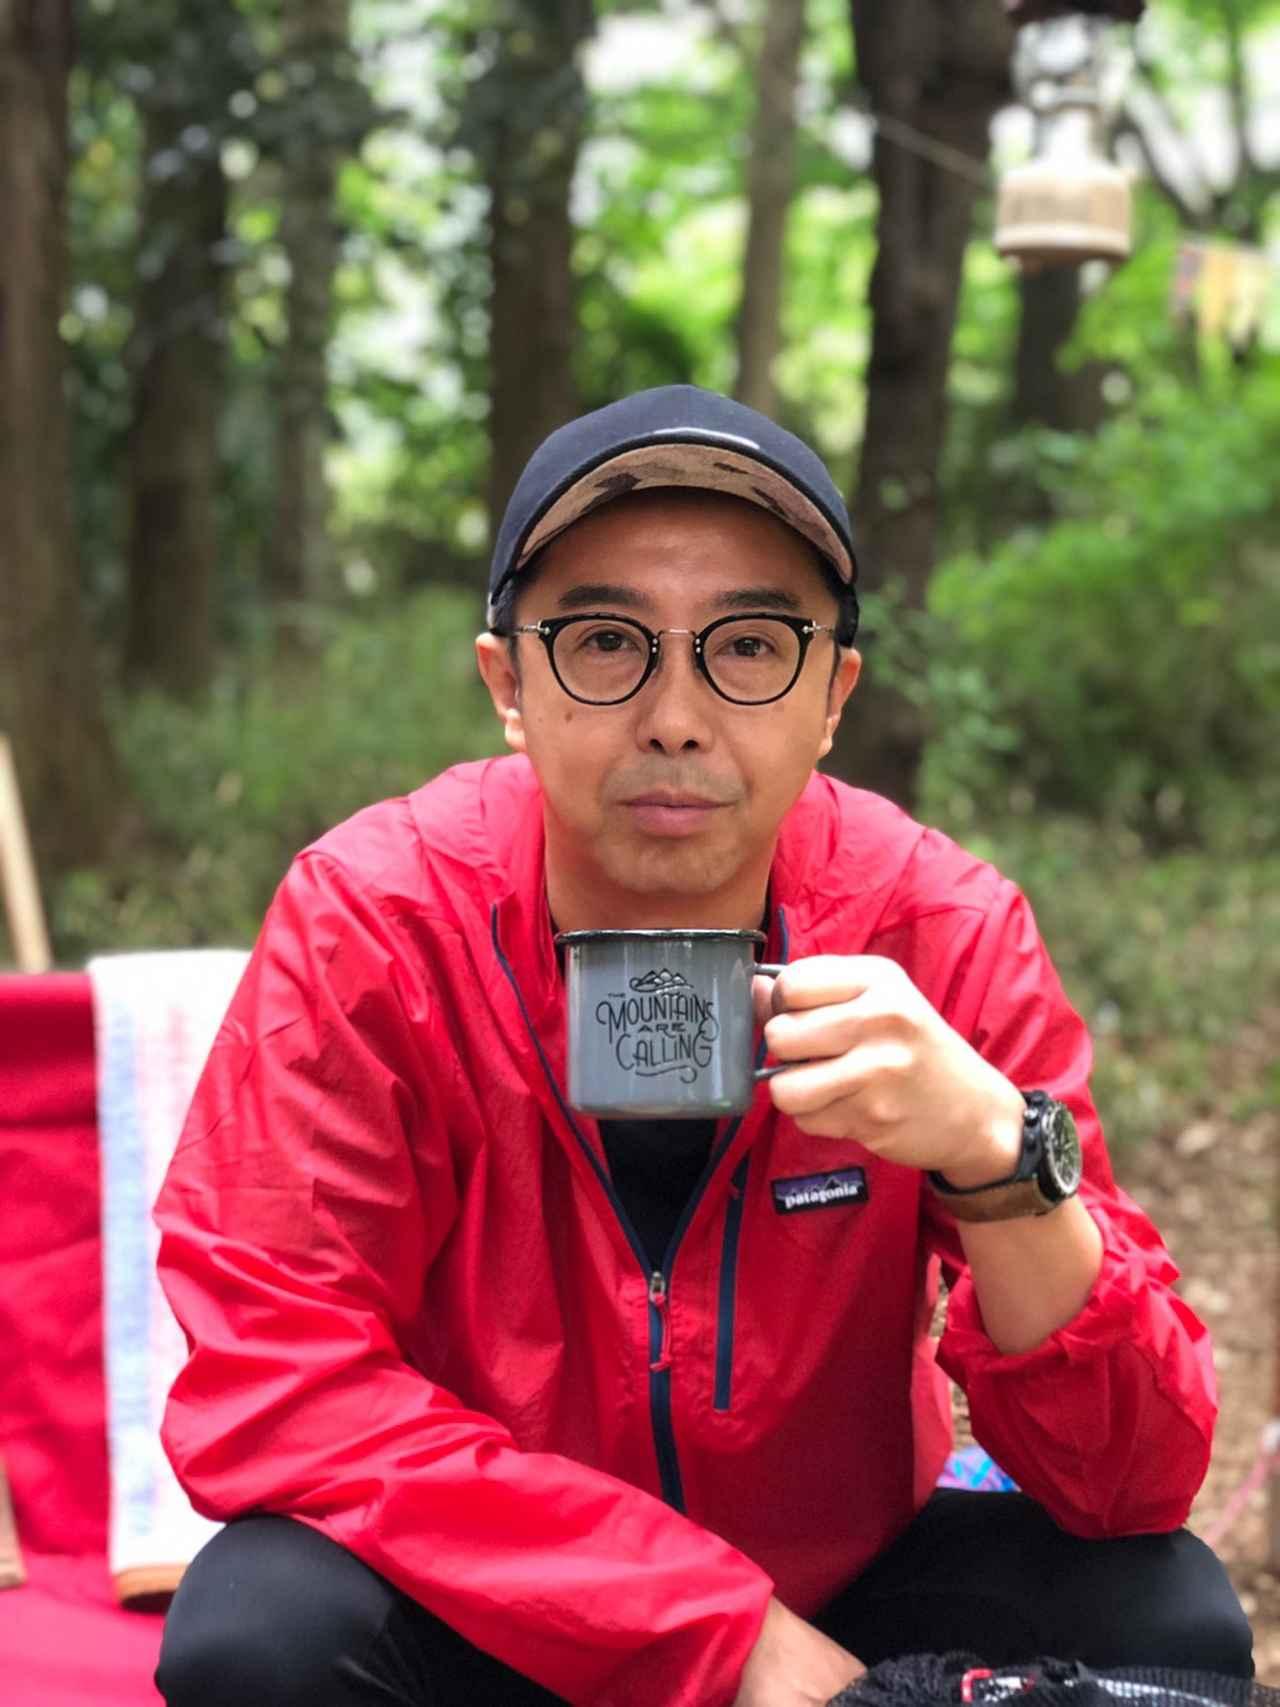 Images : 1番目の画像 - おぎやはぎのハピキャン「映えキャンプ」写真集 - ハピキャン(HAPPY CAMPER)